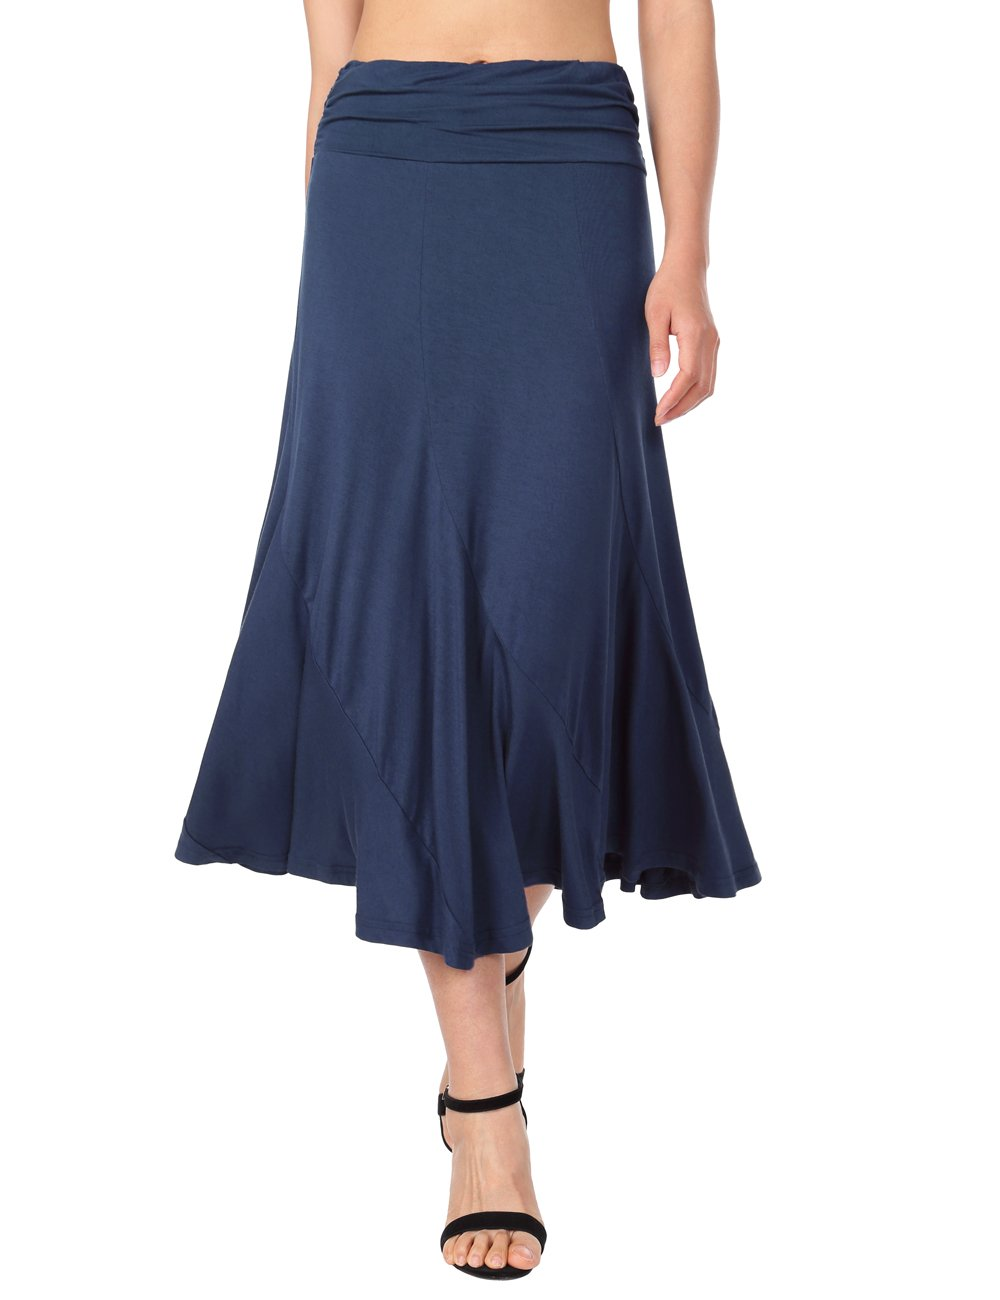 DJT FASHION Pleated Midi Skirt,DJT Women's Vintage High Waist Shirring A-Line Long Midi Skirt X-Large Navy